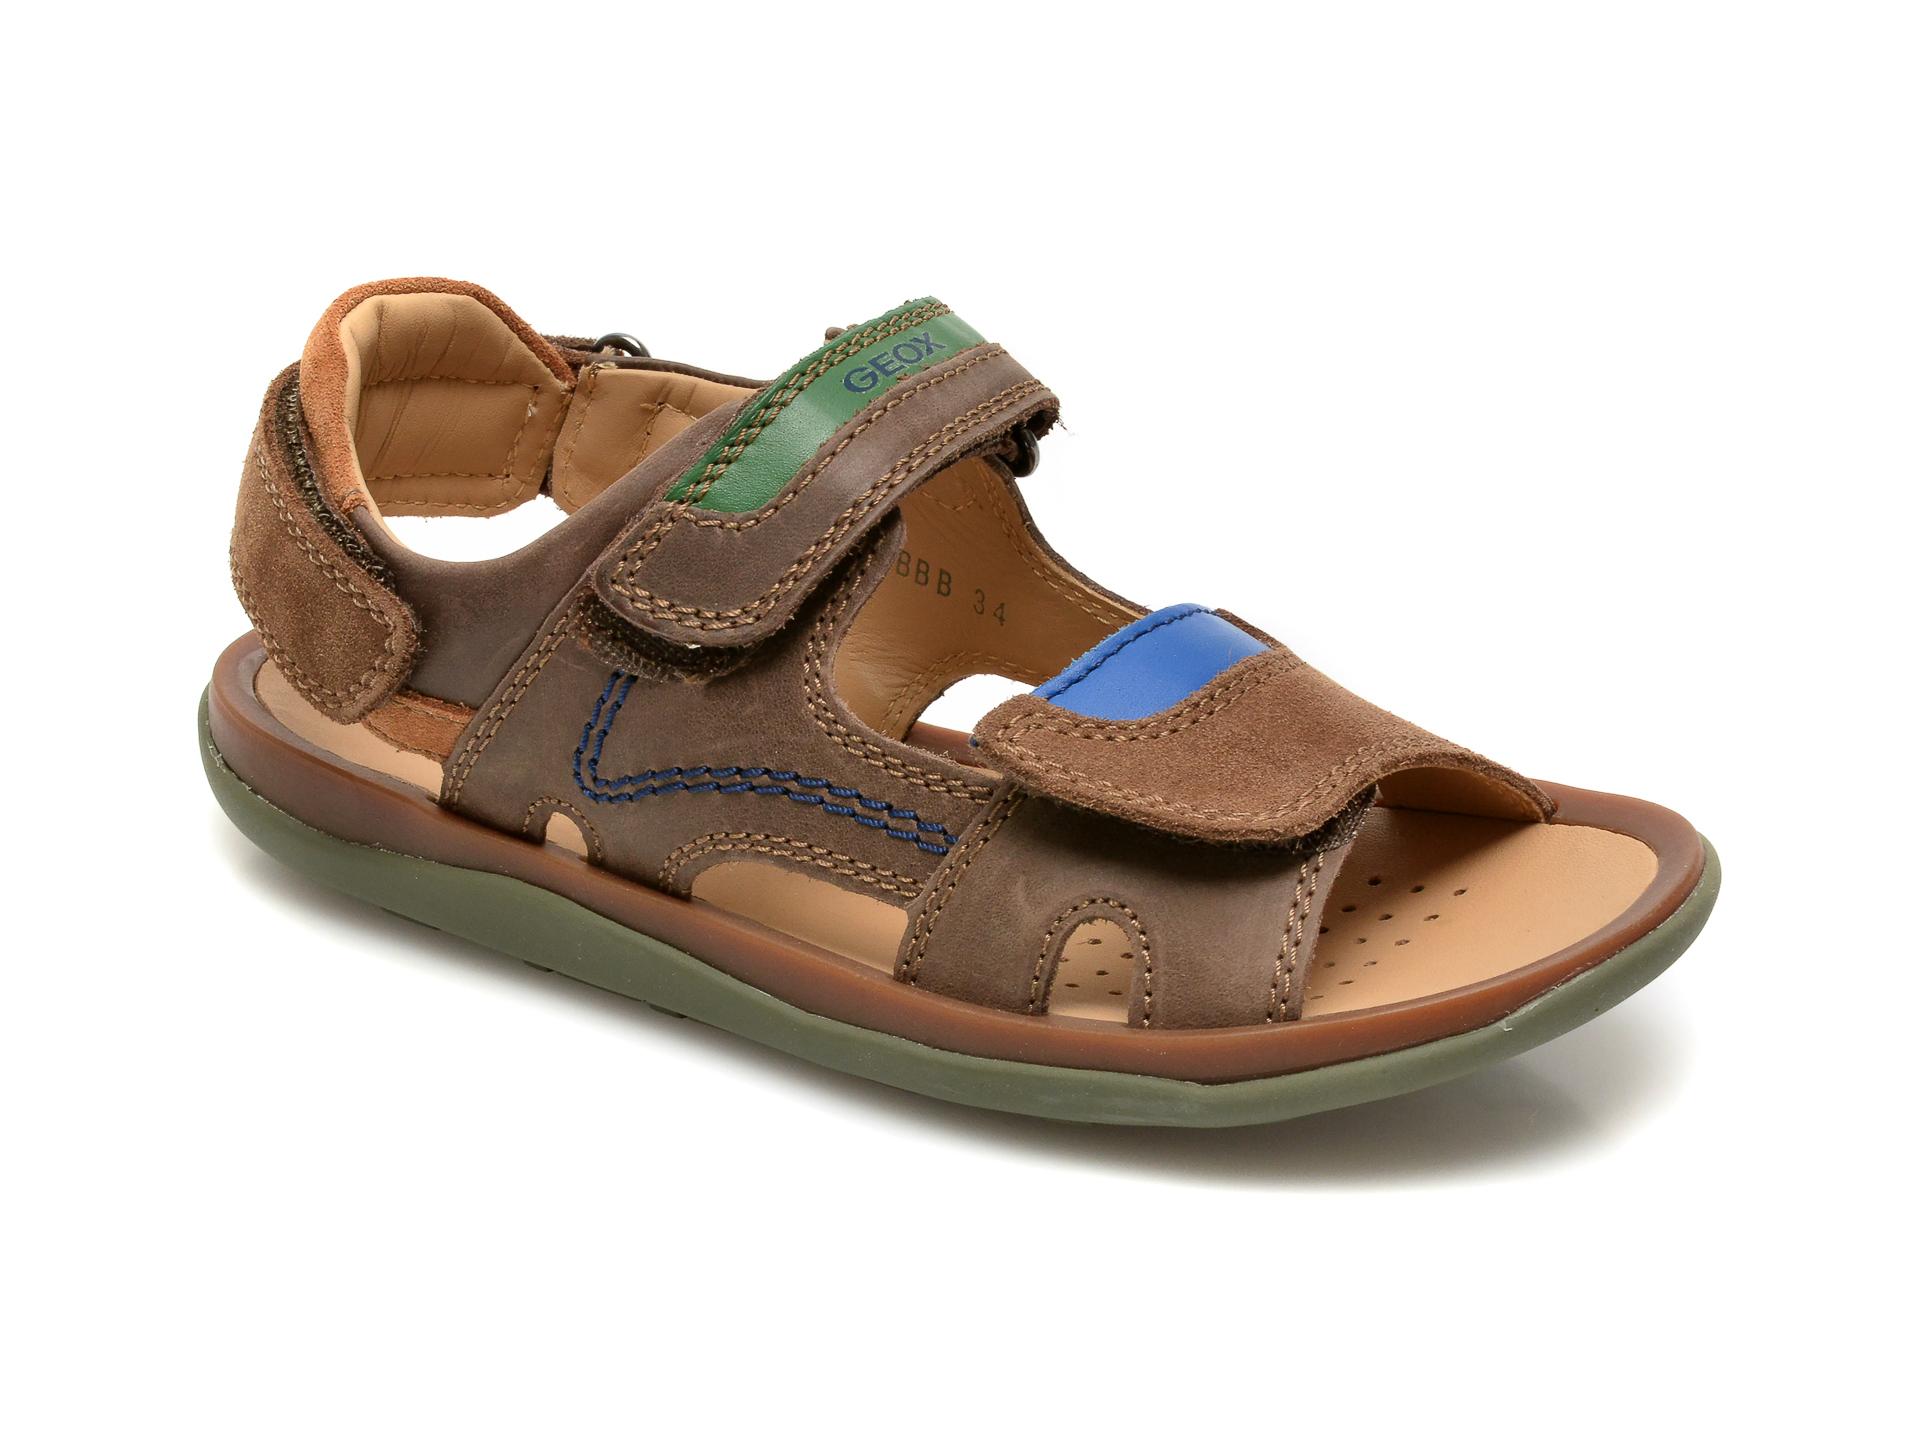 Sandale GEOX maro, J02BBB, din piele naturala